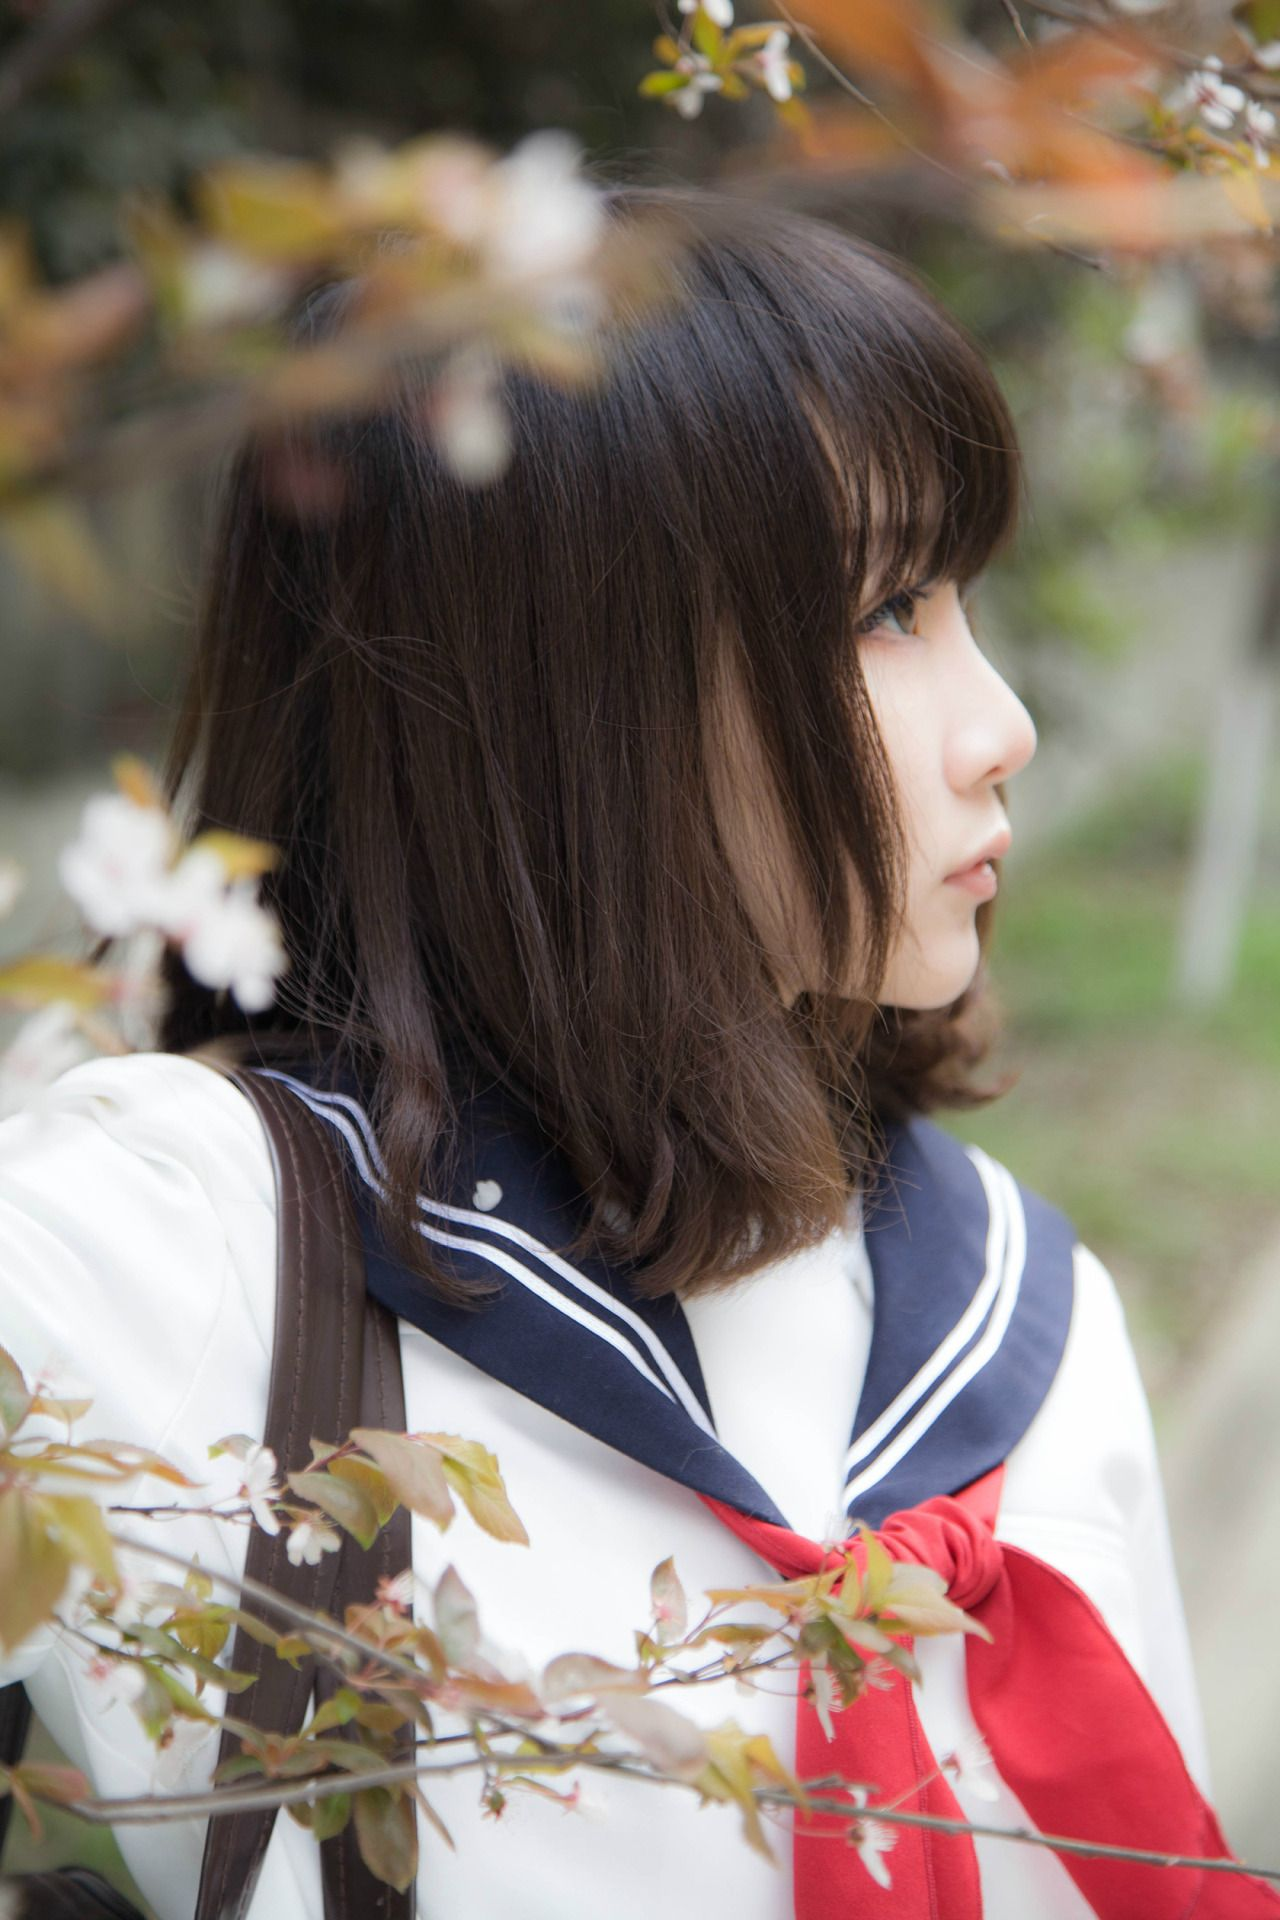 japanische kogal nackt